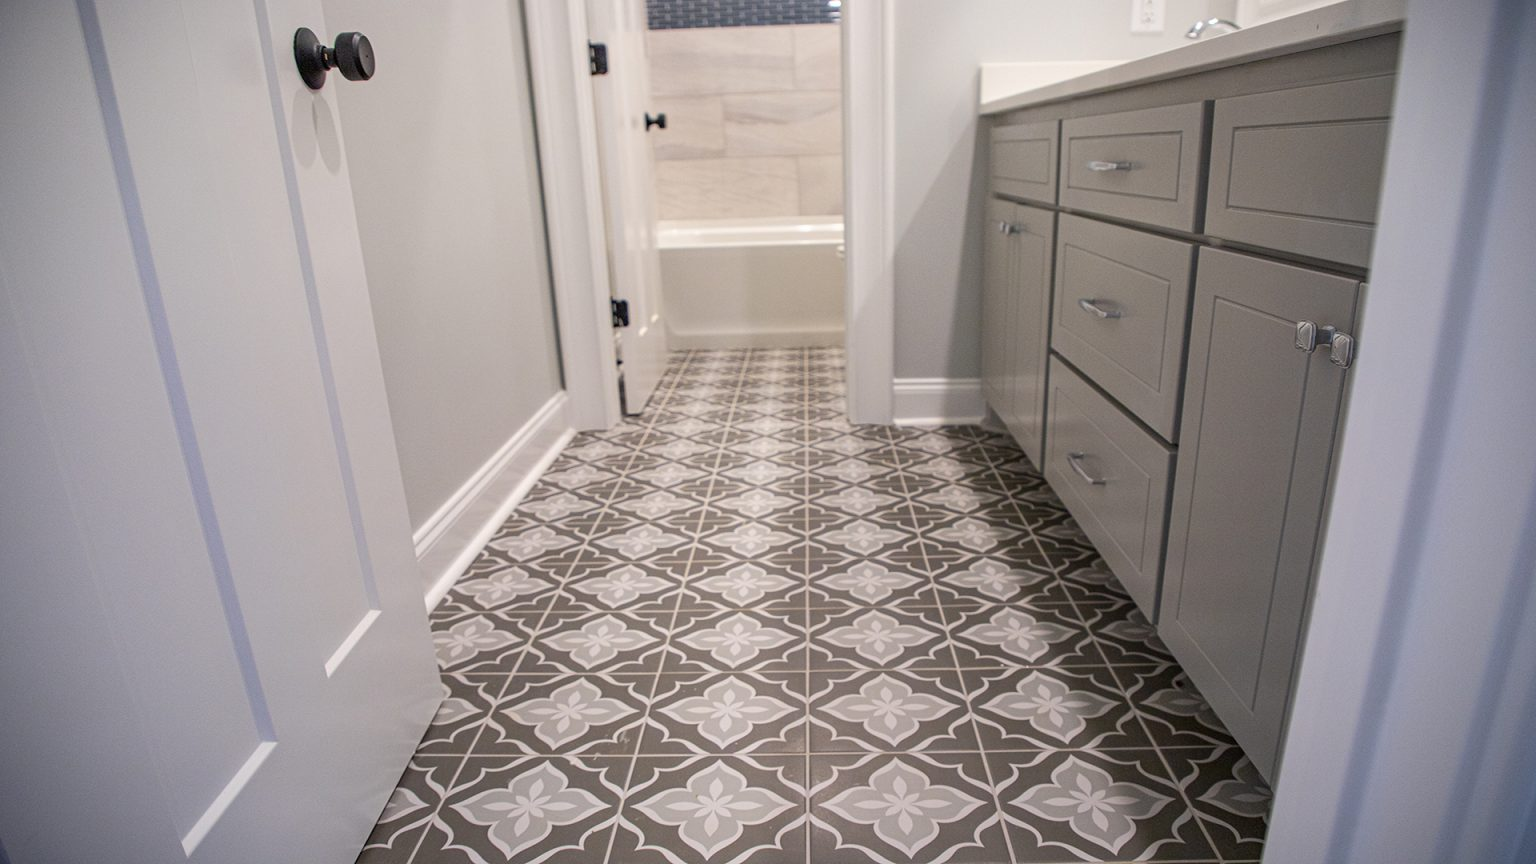 mosaic tile bathroom flooring brandon mississippi